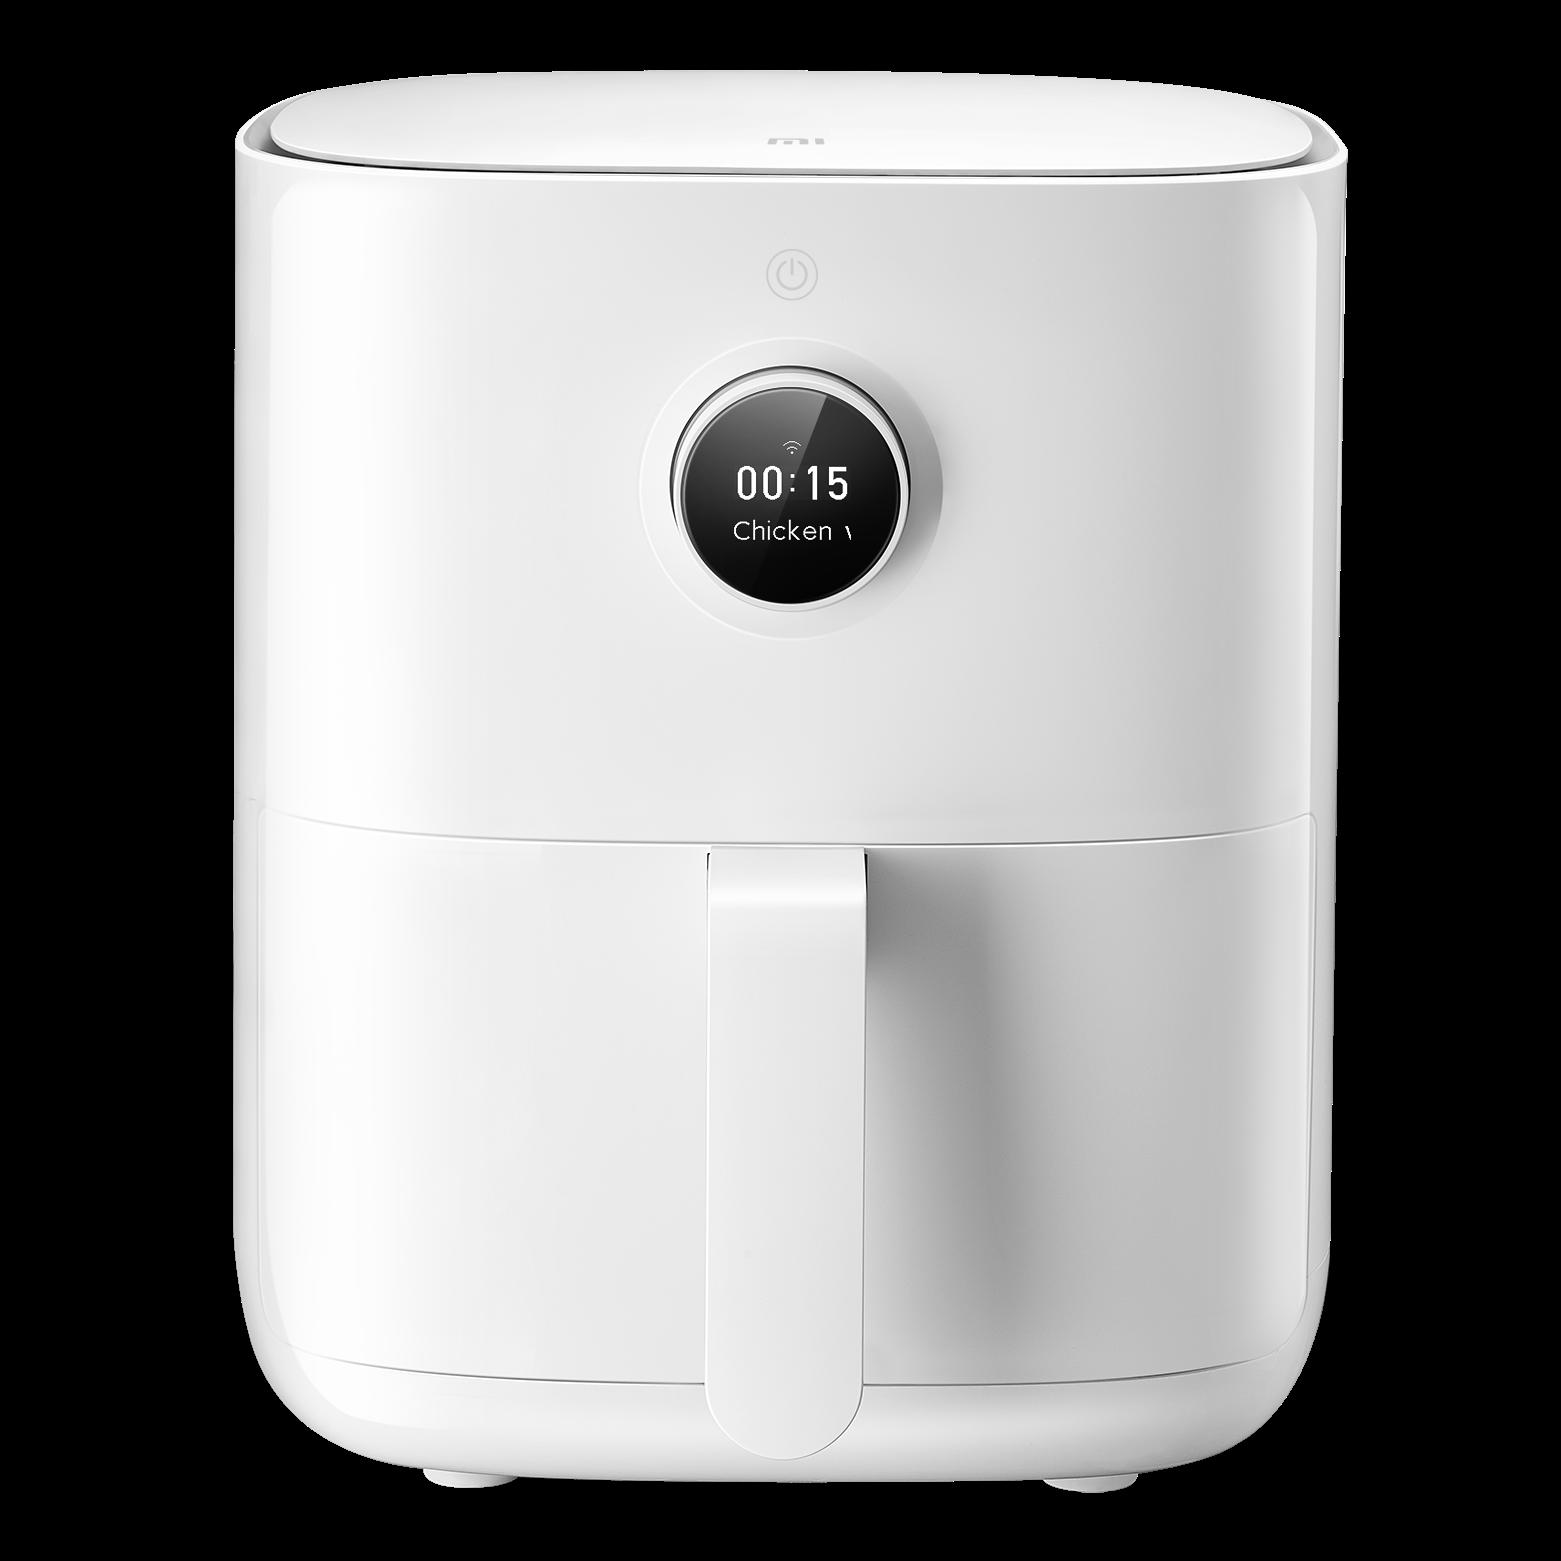 Mi Smart Air Fryer Render 5